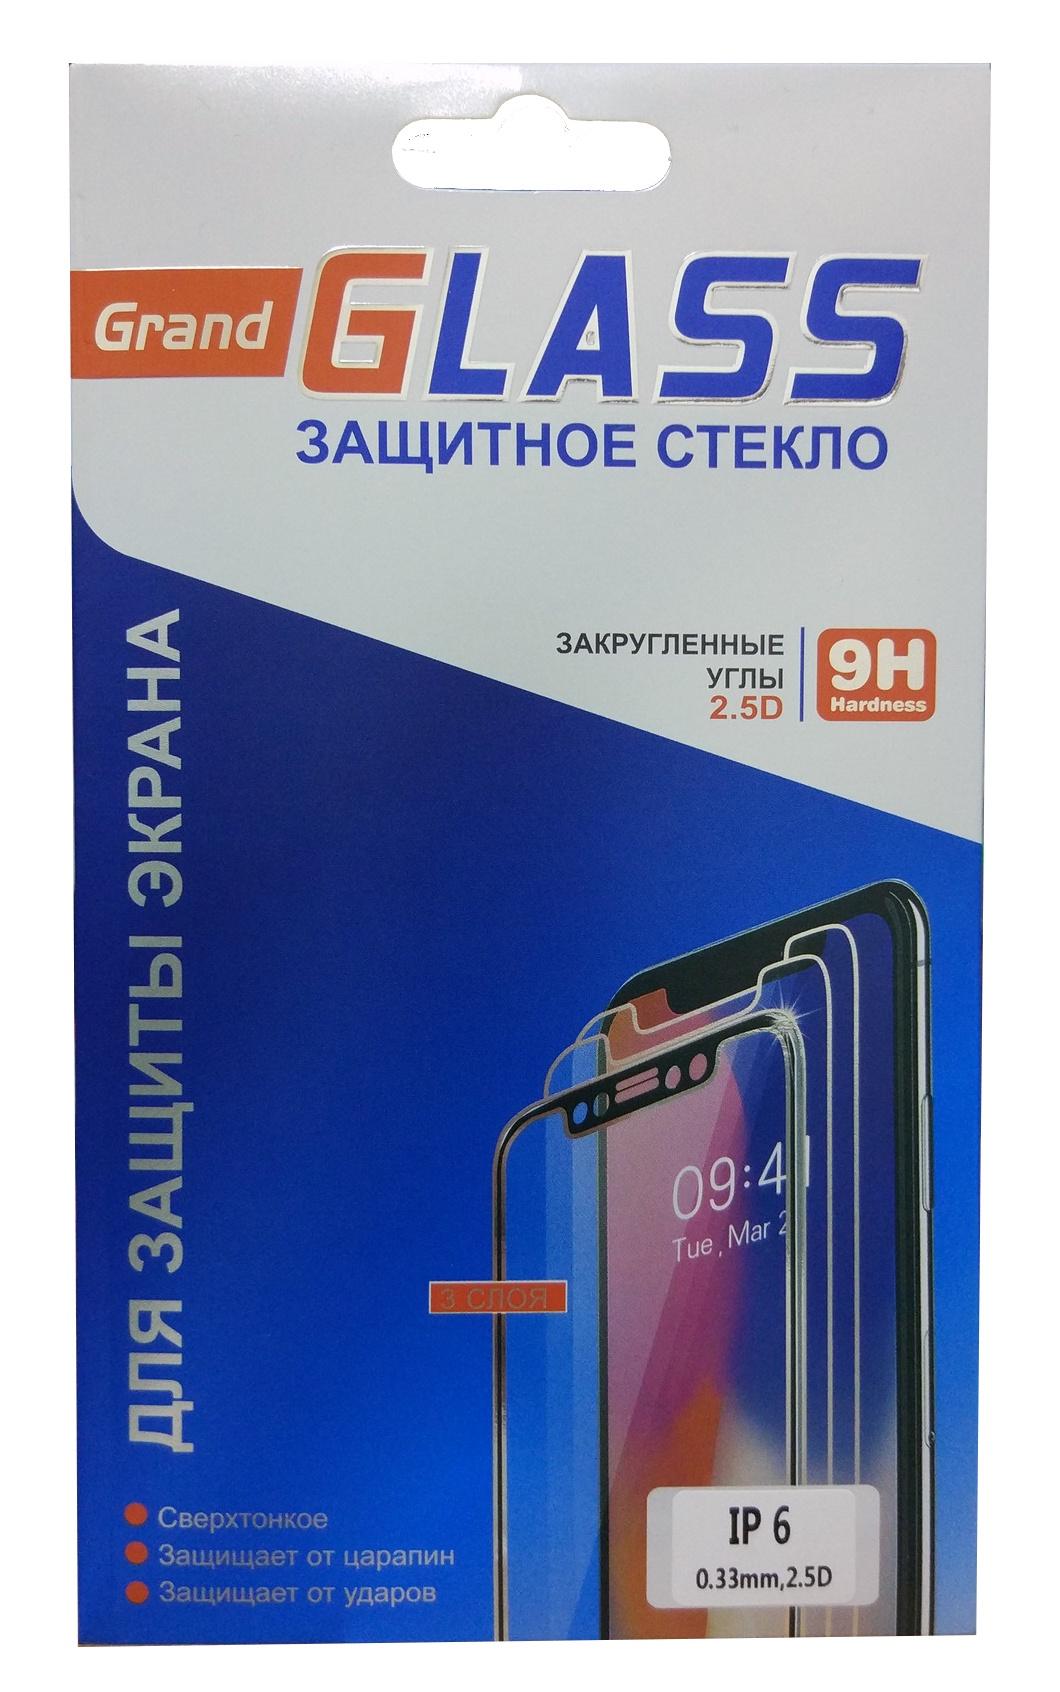 Защитное стекло для iPhone 6 / 6S защитное стекло с силиконовыми краями perfeo для черного iphone 6 6s глянцевое pf tg3d iph6 blk